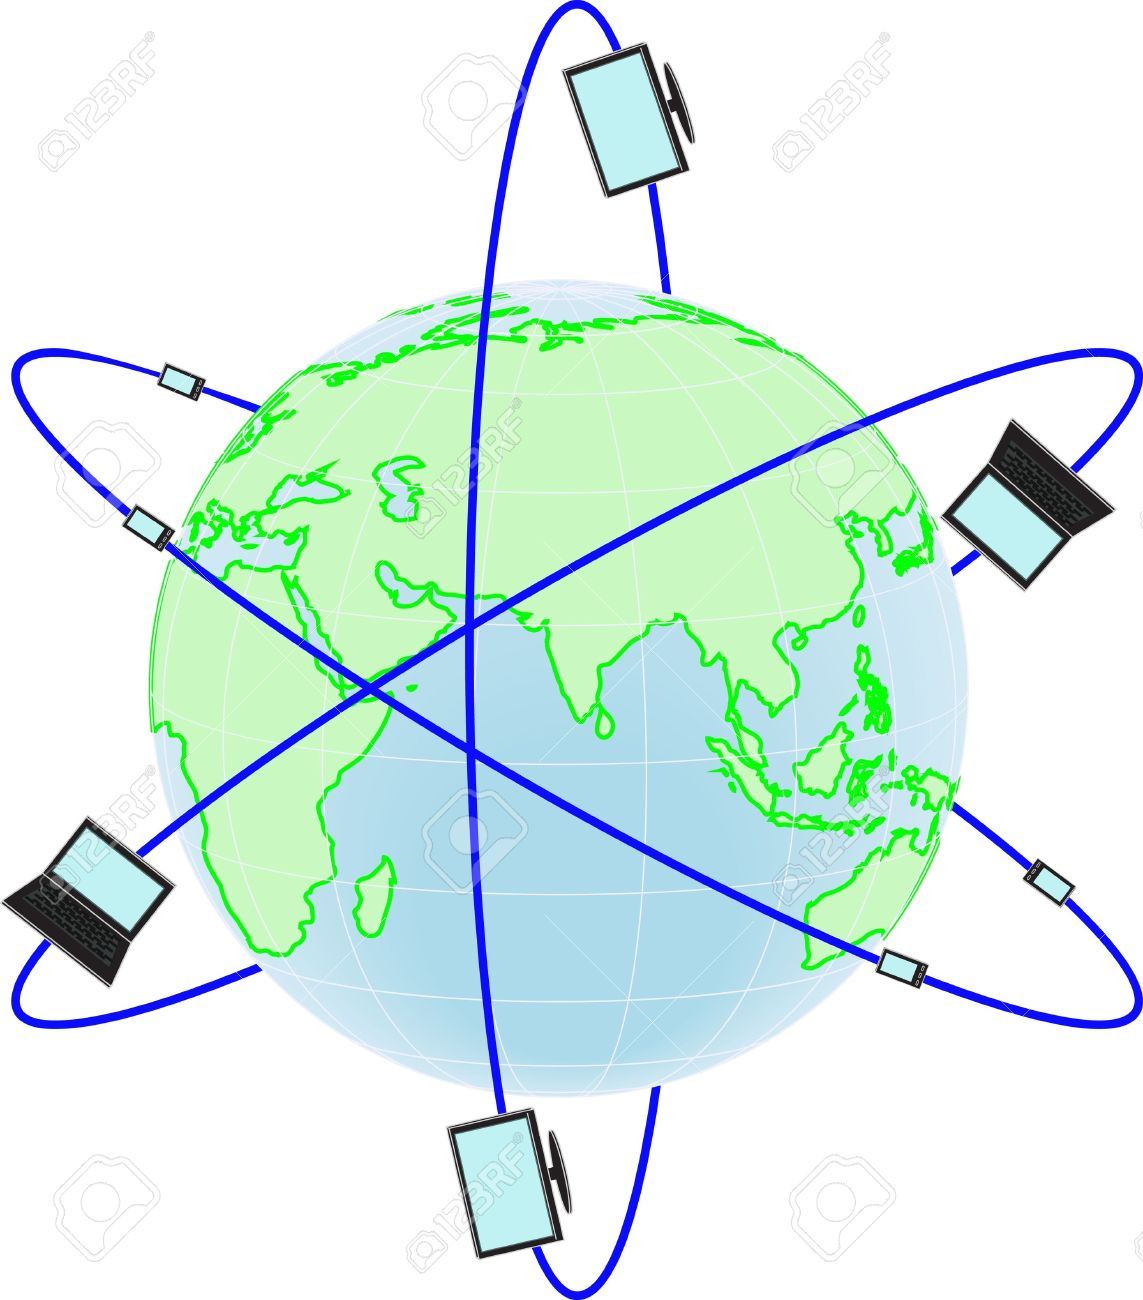 Globe telecom clipart.